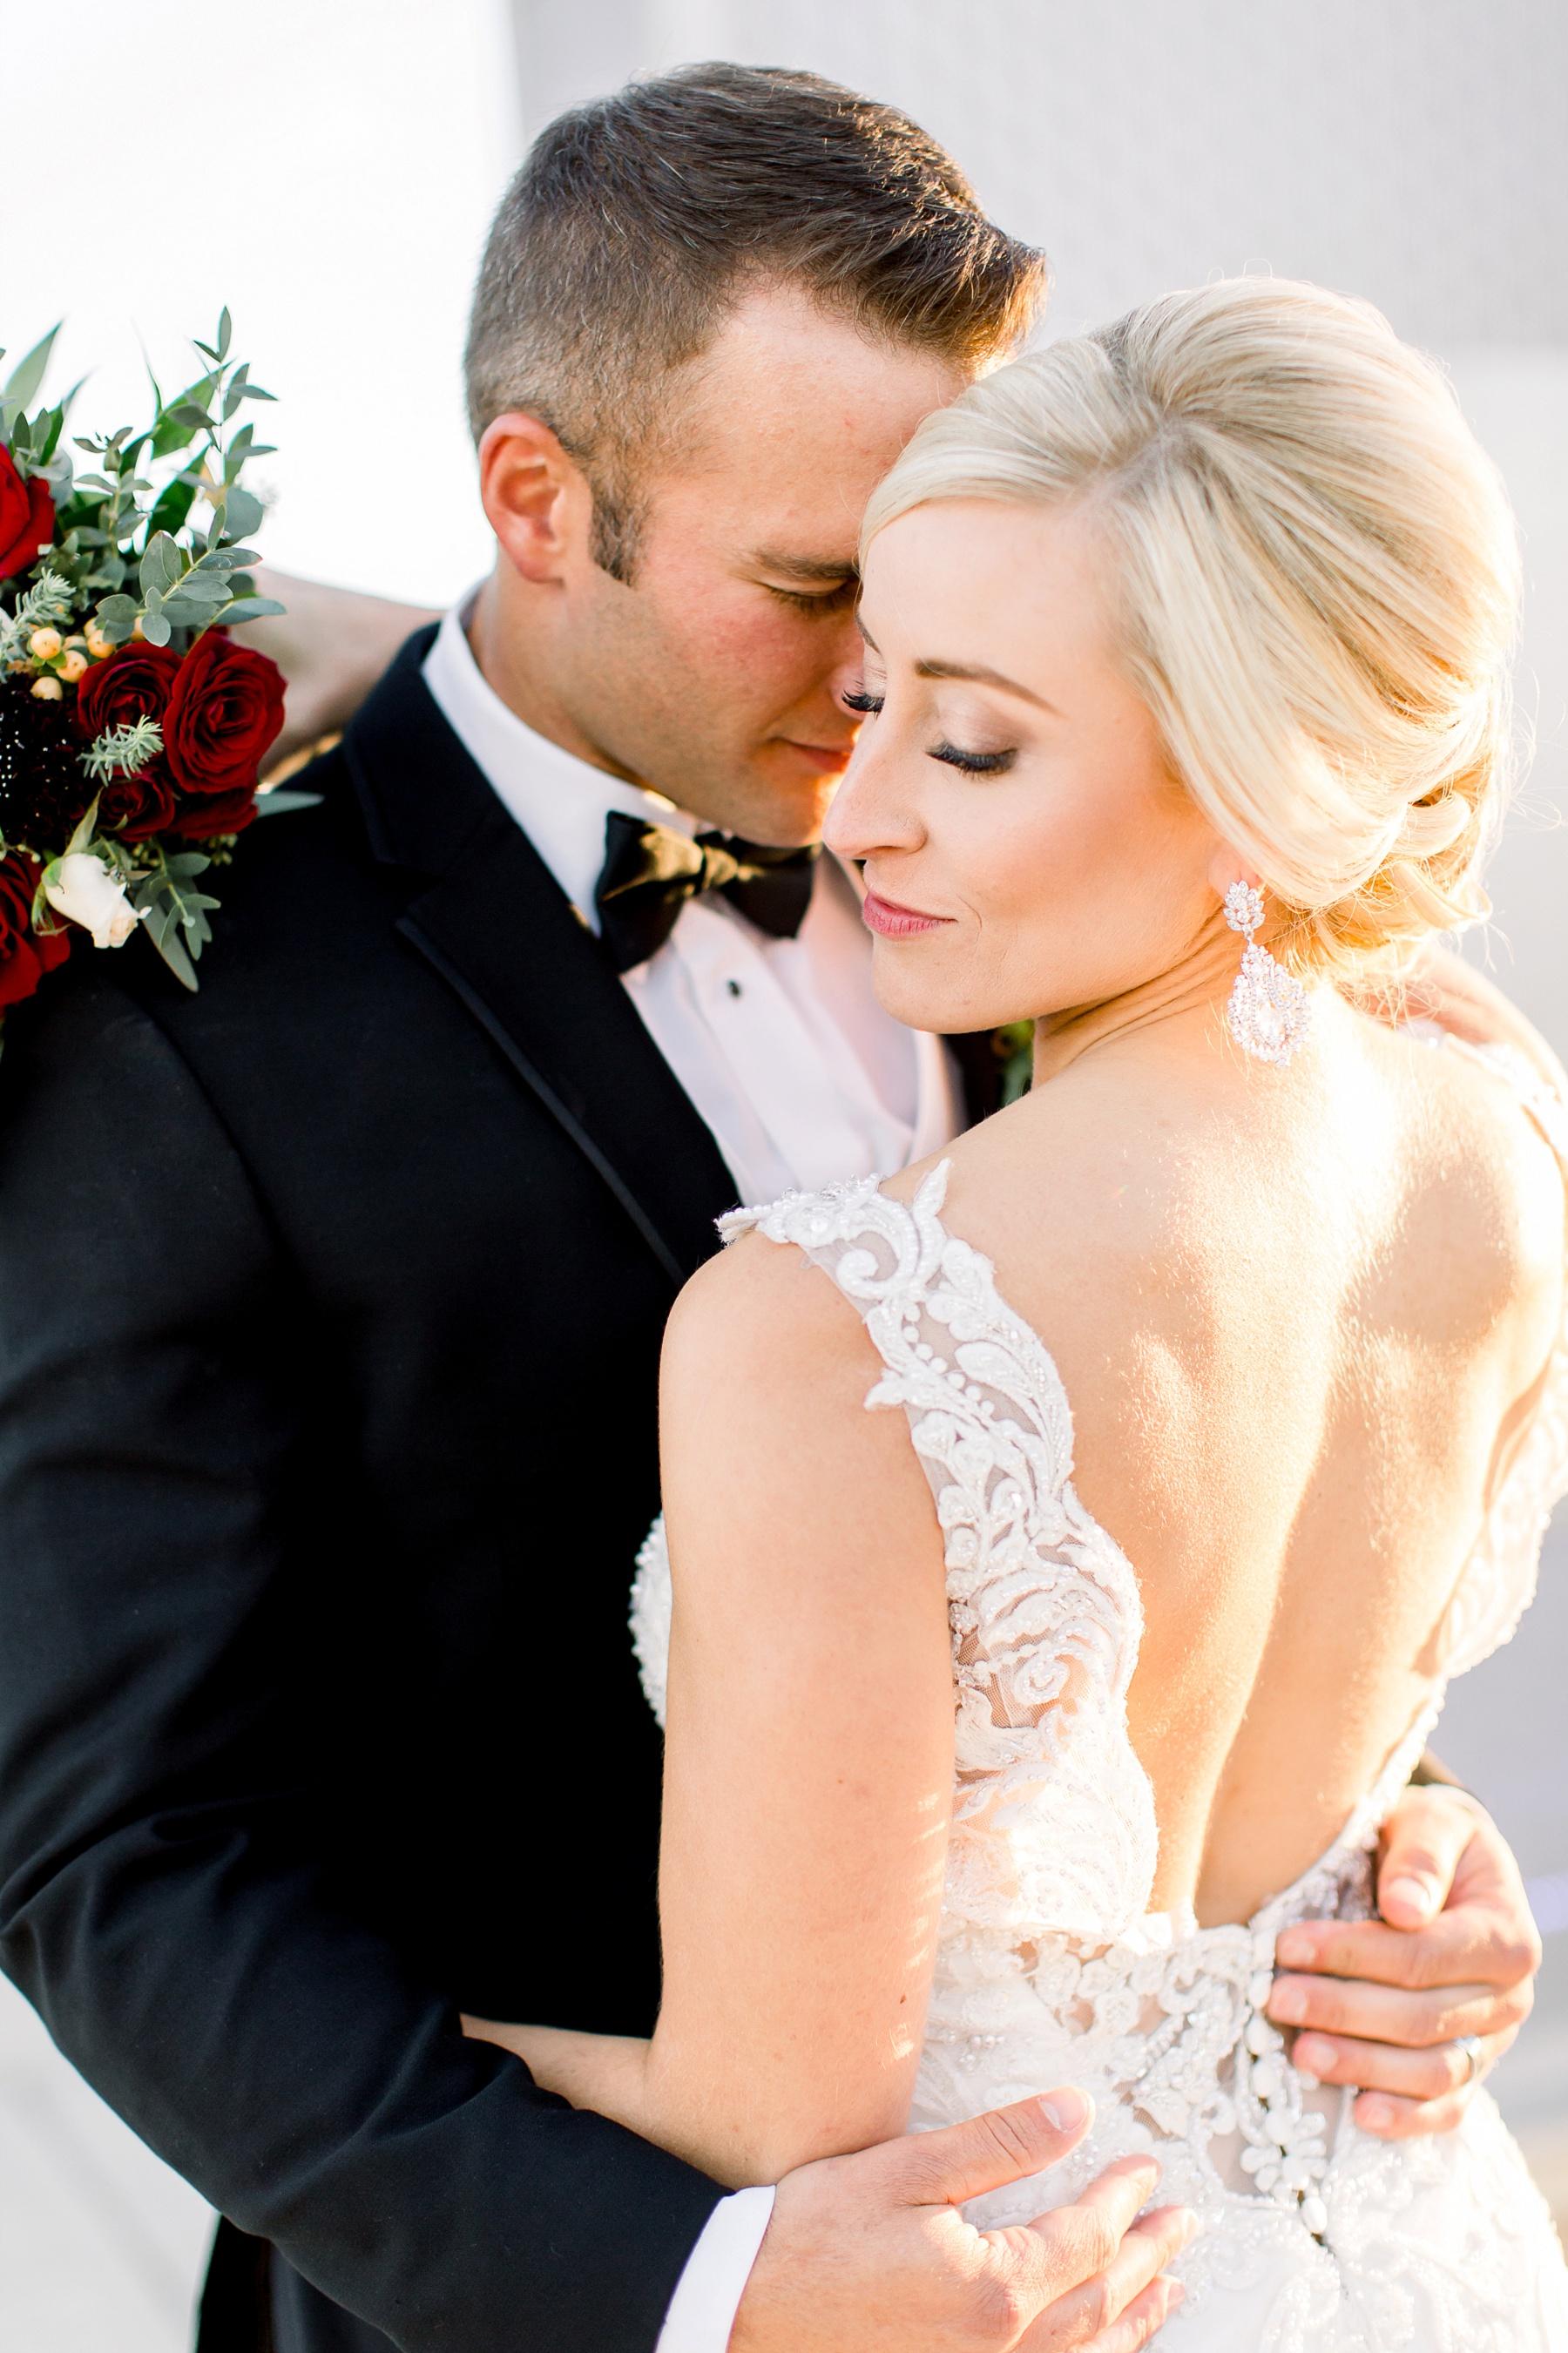 midwest-adventurous-wedding-photographer-elizabeth-ladean-photography-photo_4814.jpg